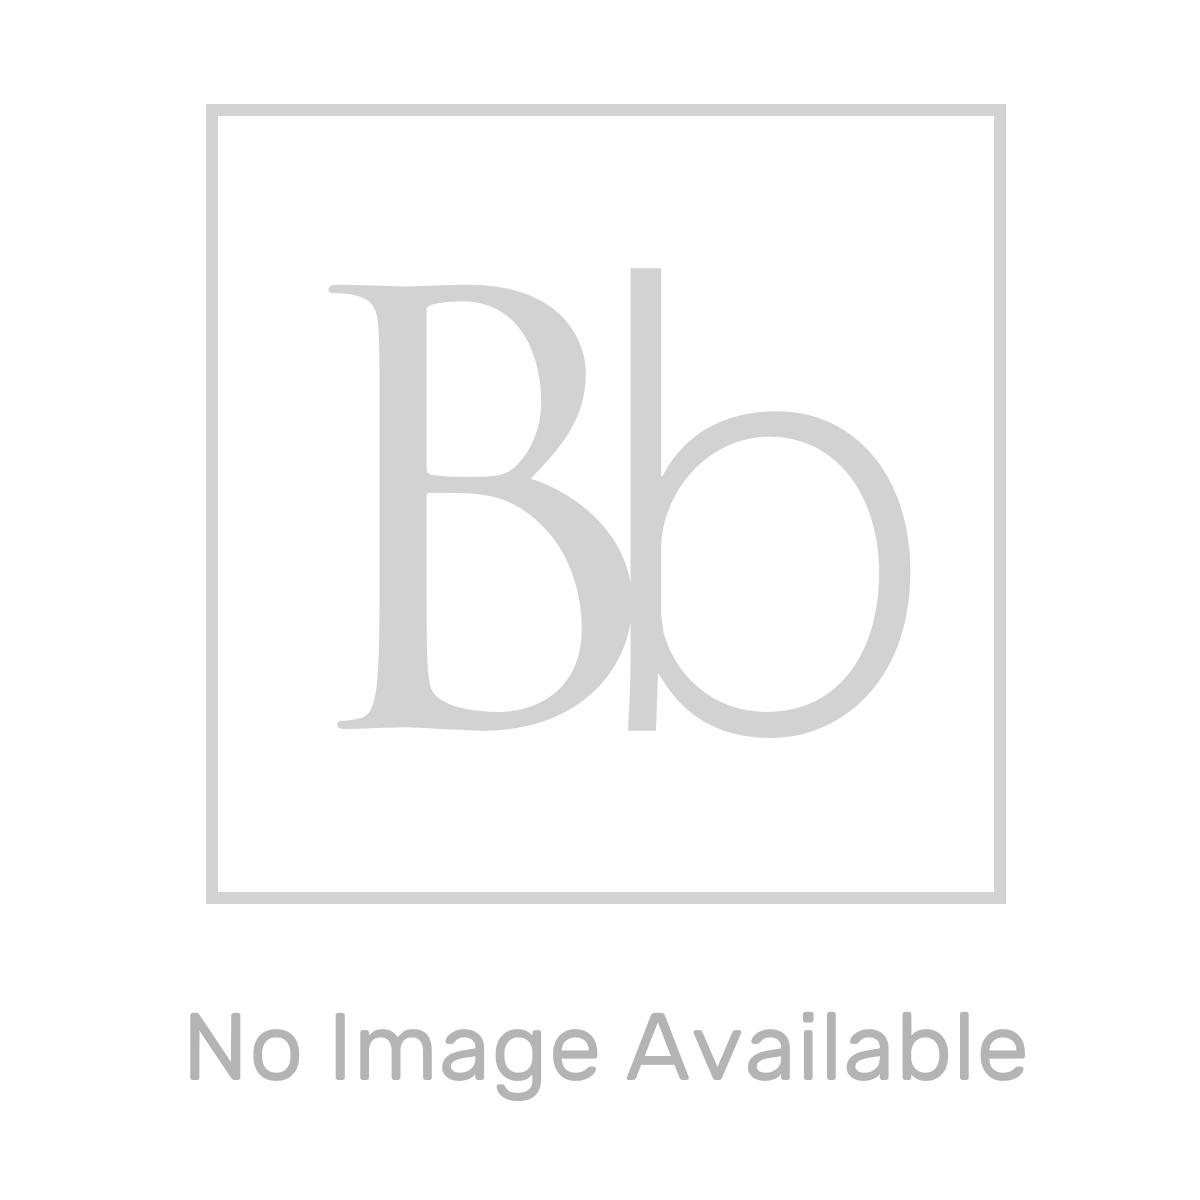 BTL Tuscany White Wall Hung Toilet & Soft Close Seat Lifestyle